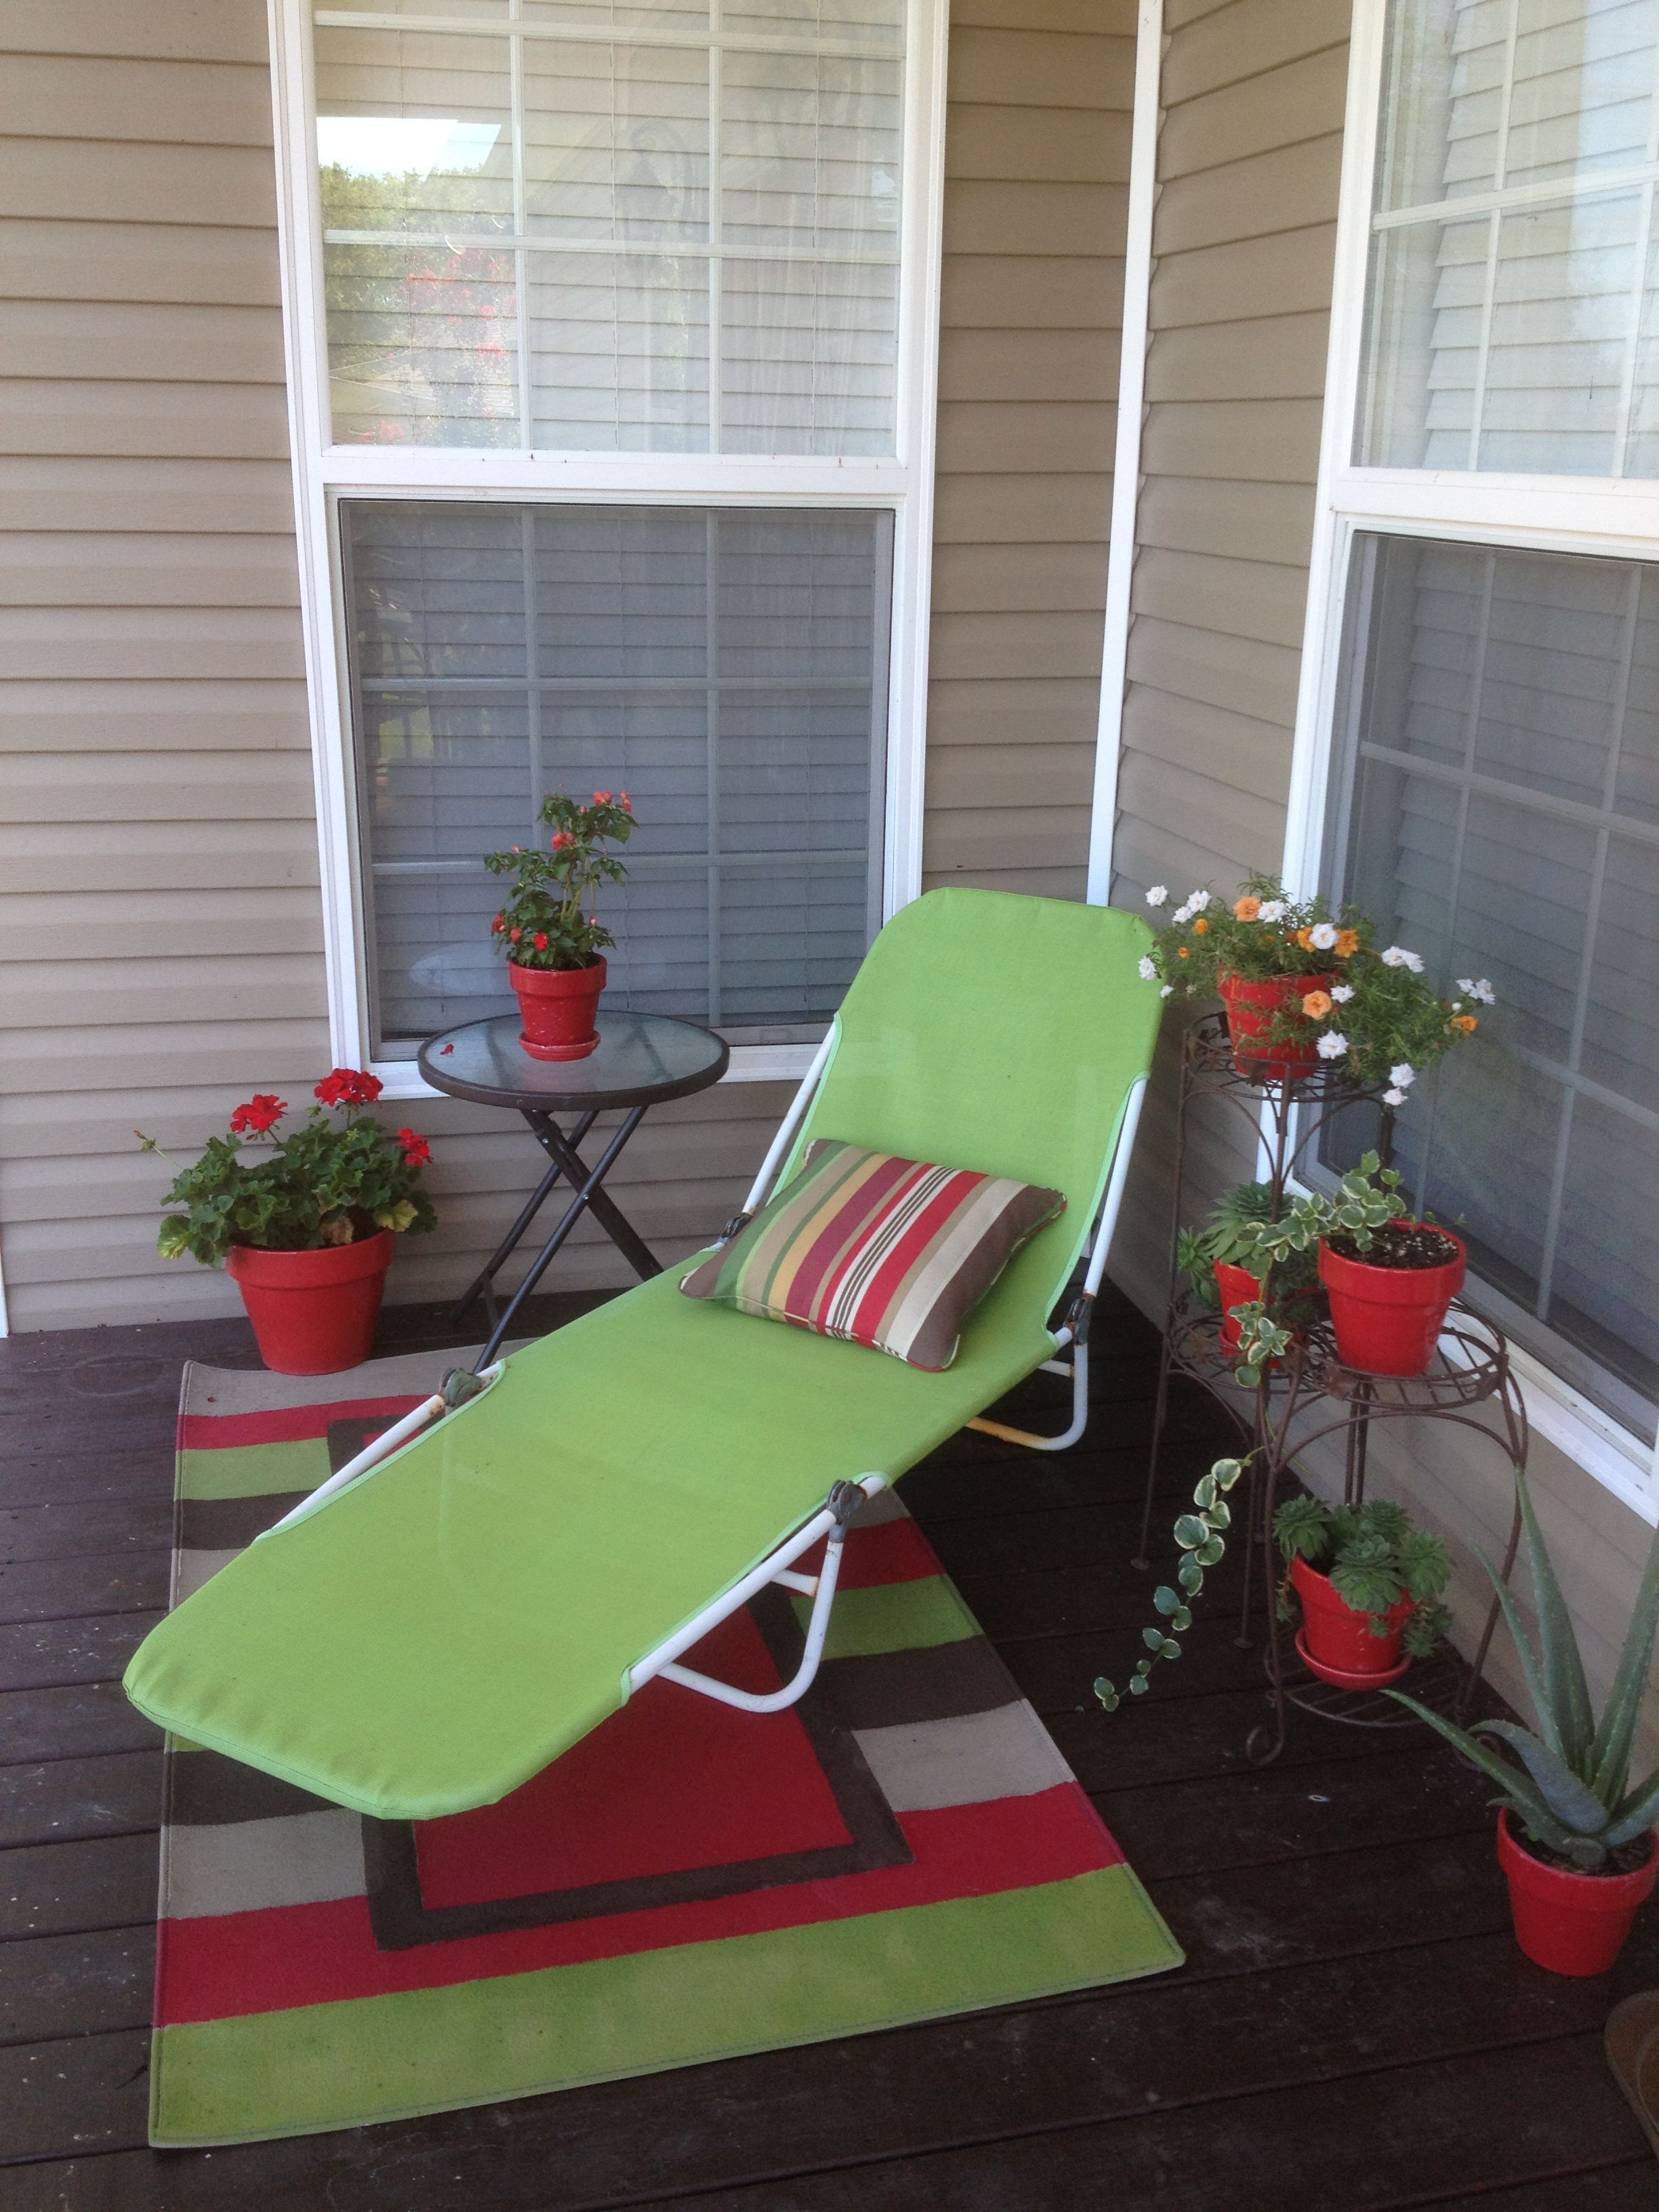 Comfy back porch nook   Porch nook, Small apartment living ... on Apartment Back Porch Ideas id=77472